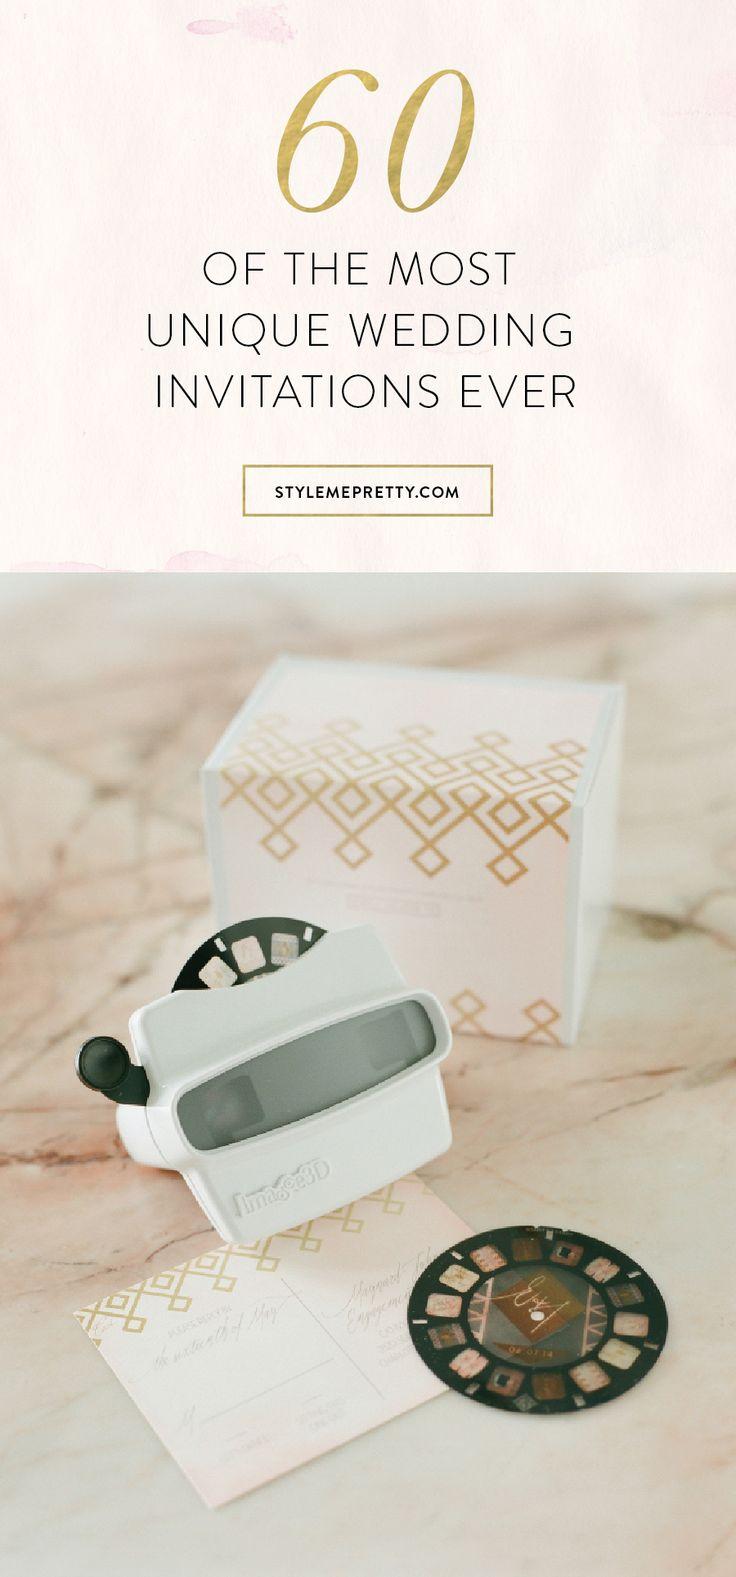 Best 25+ Unique wedding invitations ideas on Pinterest ...